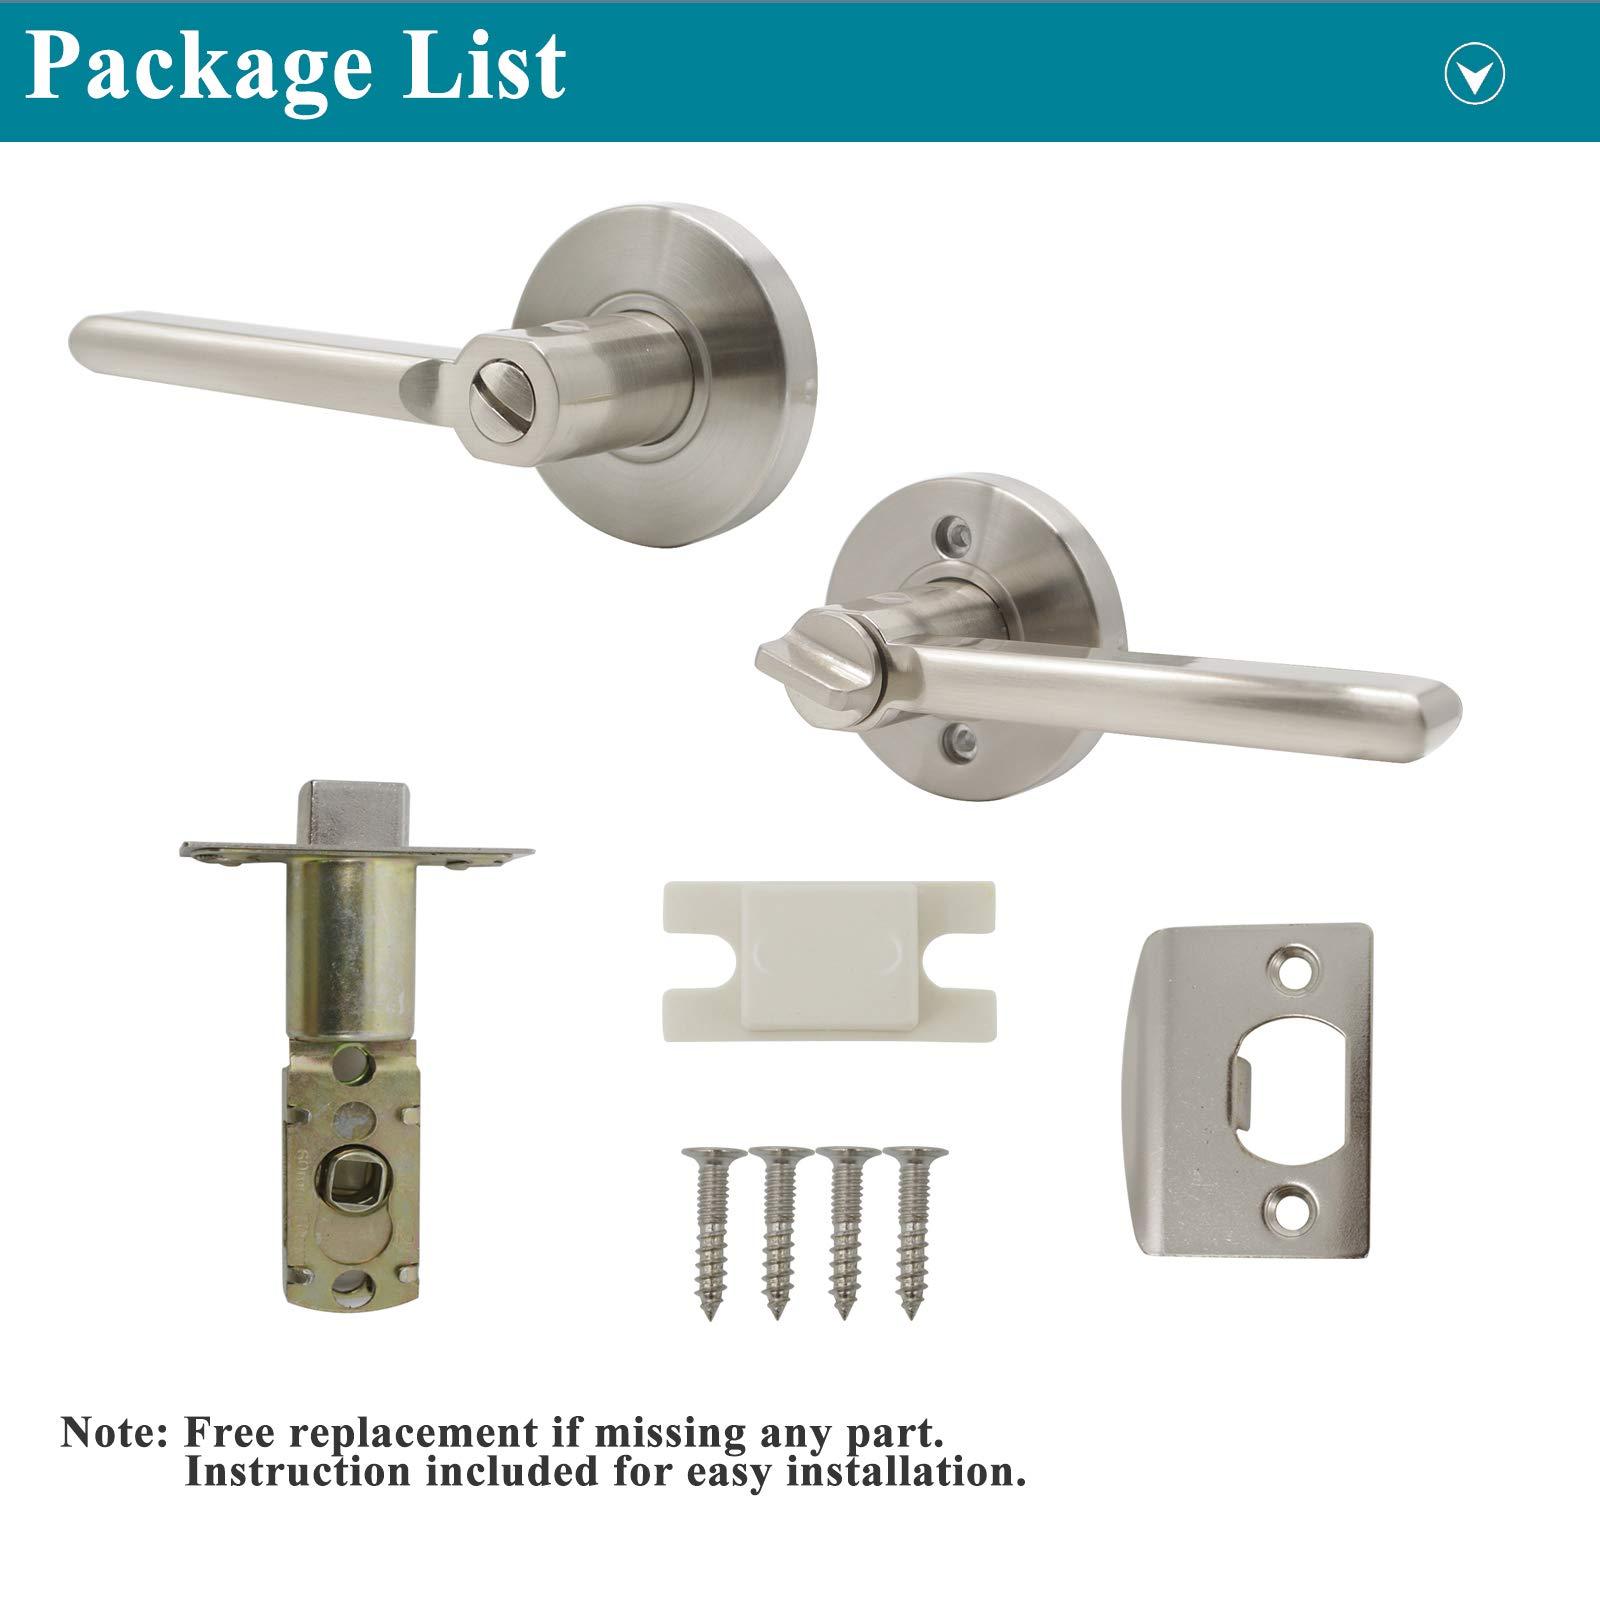 Probrico Bed/Bath Room Door Lever Modern Flat Handles in Satin Nickel, Privacy Door Lever Locks, Contractor Pack(10Pack) by Probrico (Image #6)